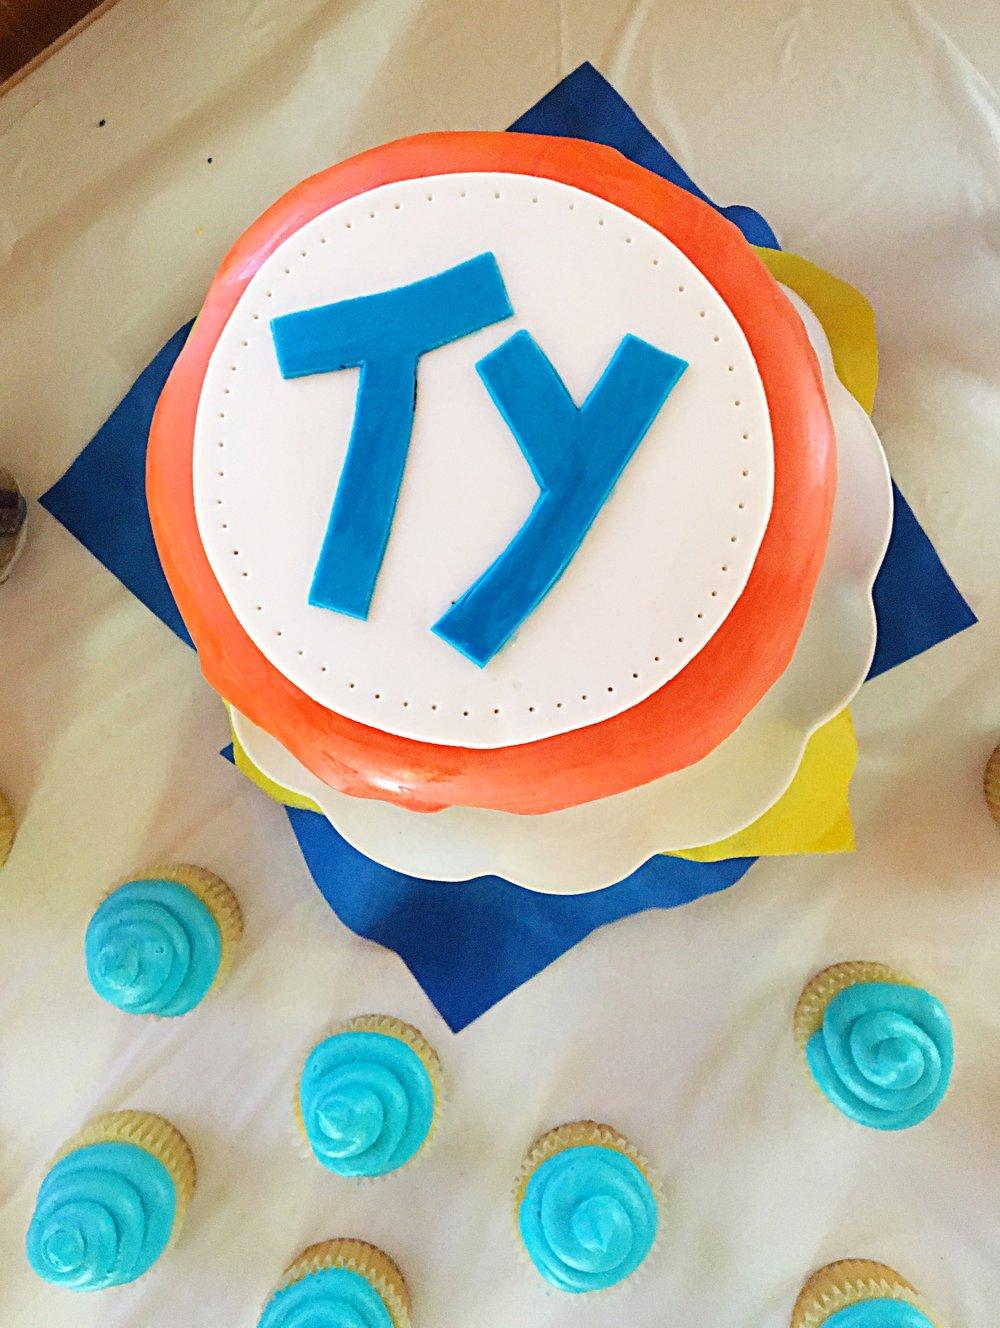 Tyson cake 2.jpg